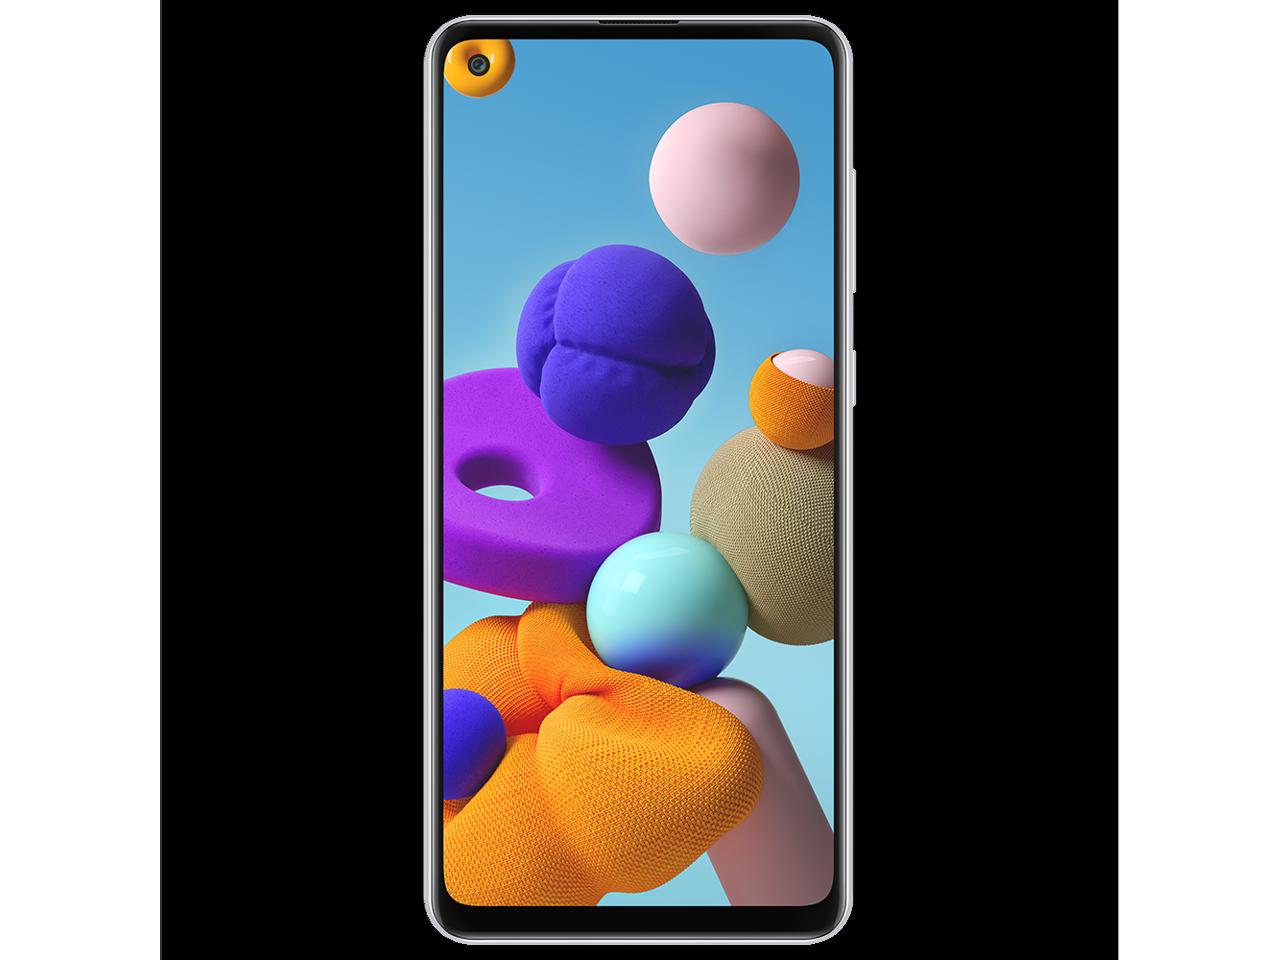 Samsung Galaxy A21s A217M 64GB Dual SIM GSM Unlocked Android SmartPhone